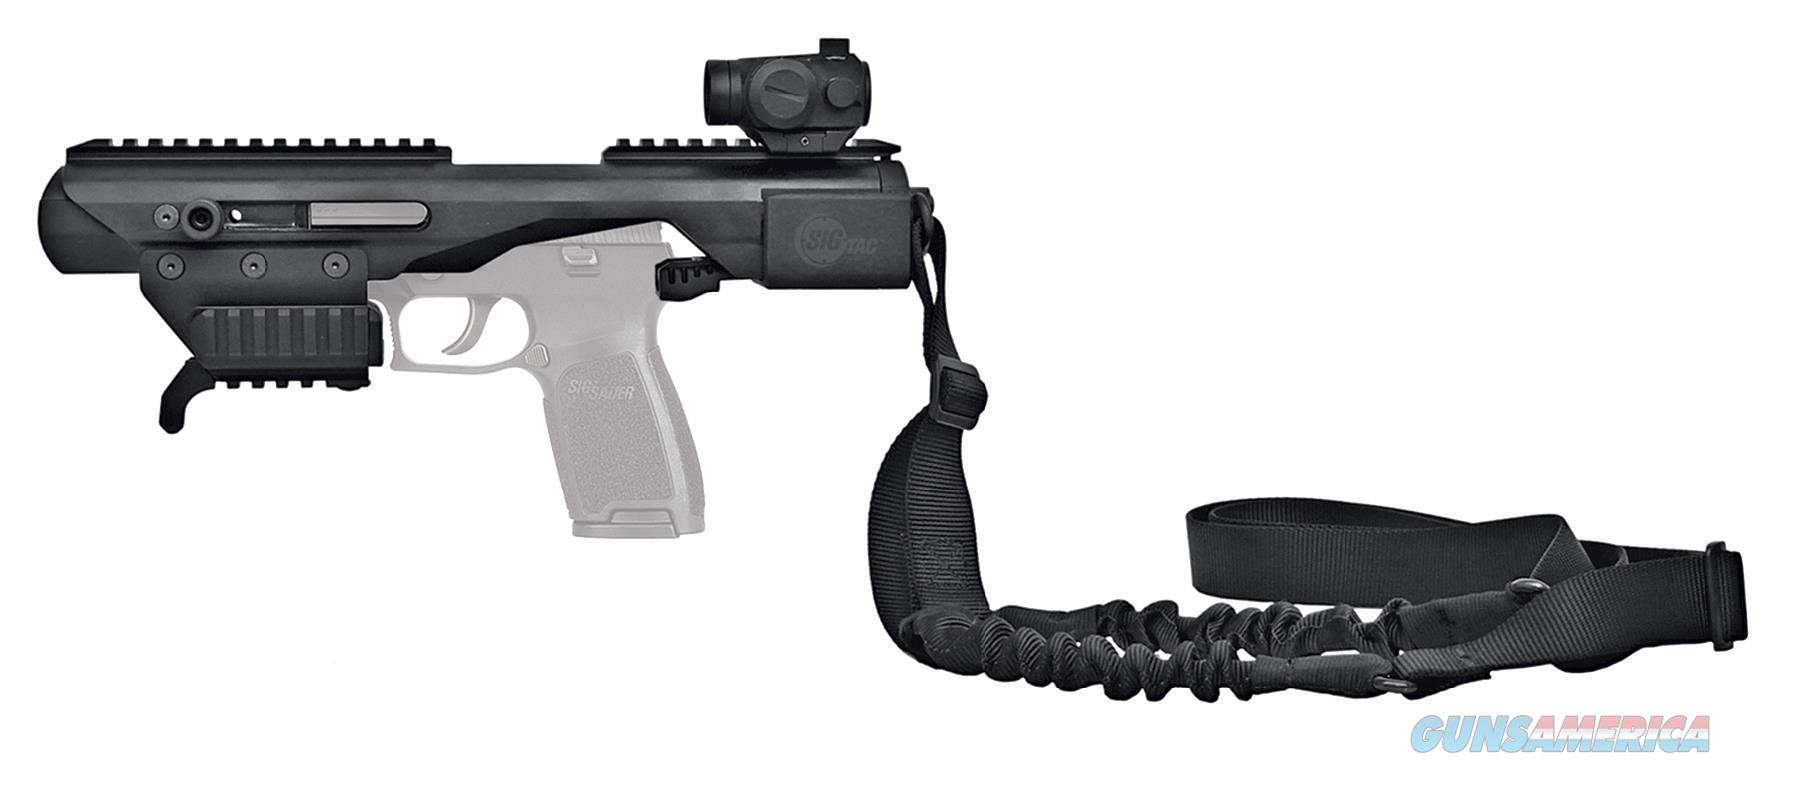 Sig Sauer Acpl Acp-L Adaptive Carbine Enhanced W/Red Dot & Bungee Sling Alum Blk ACPL  Non-Guns > Gun Parts > Misc > Rifles